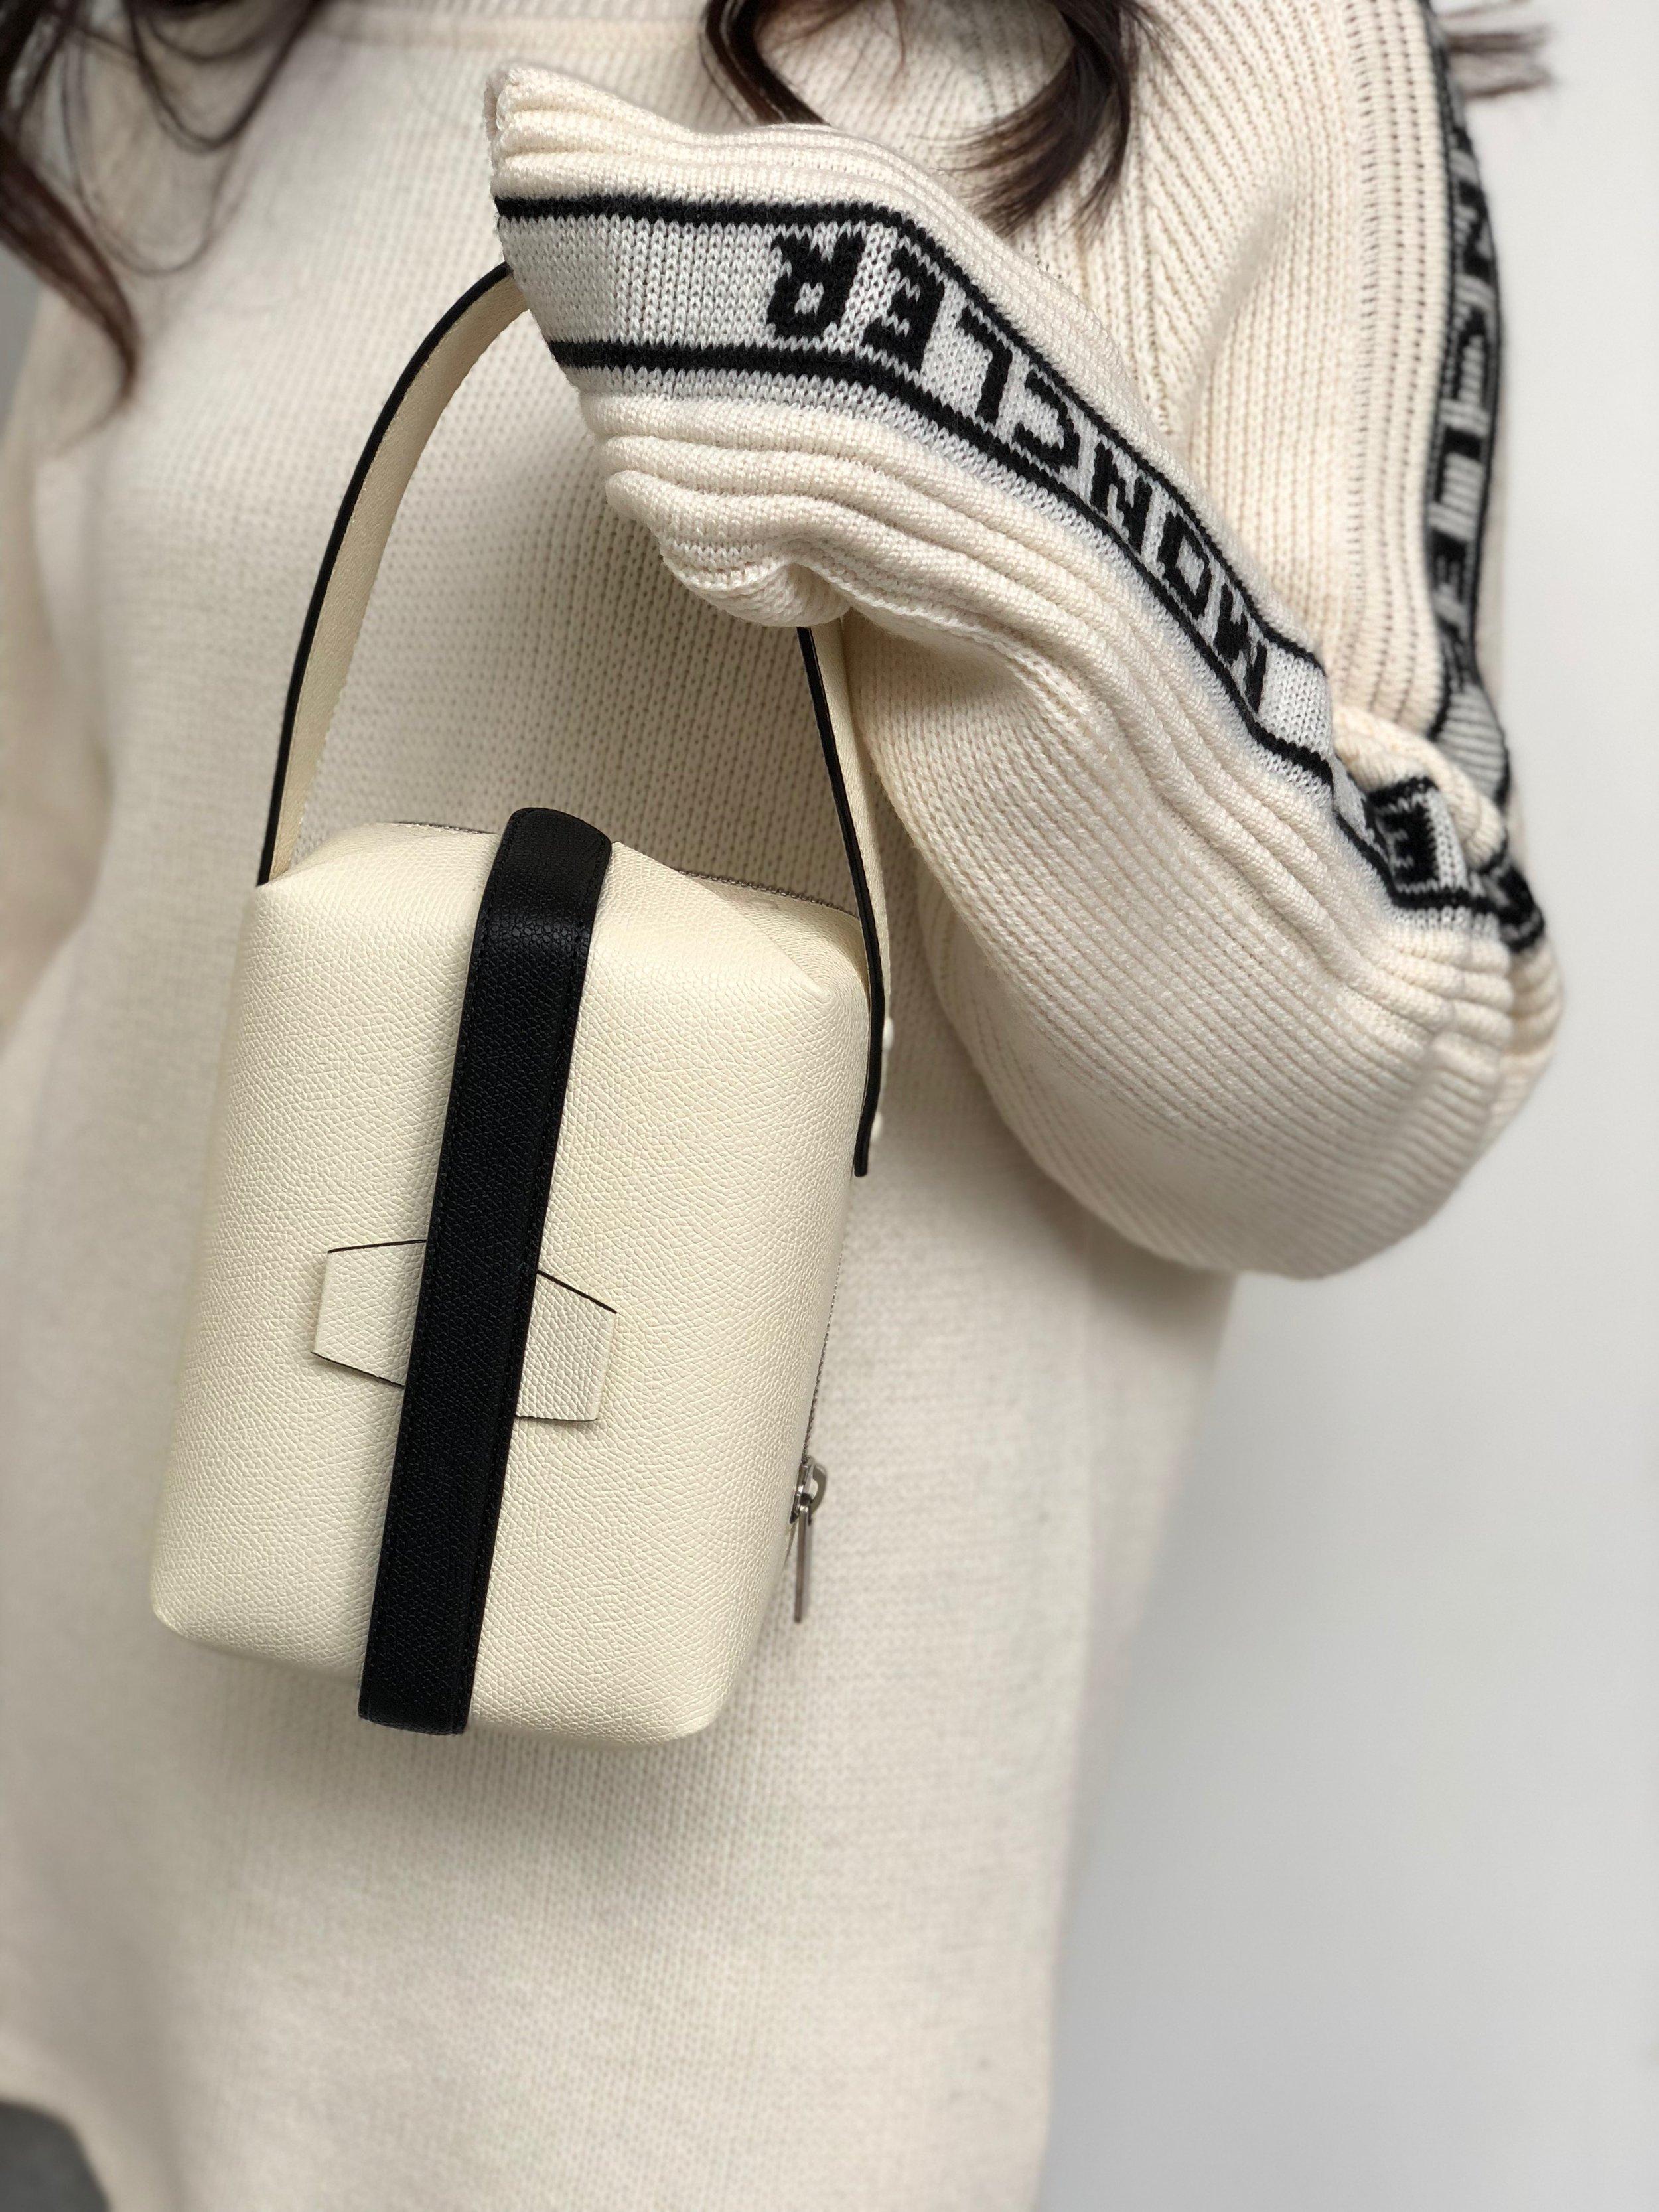 Favorite item #2 - The cutest Valextra purse.